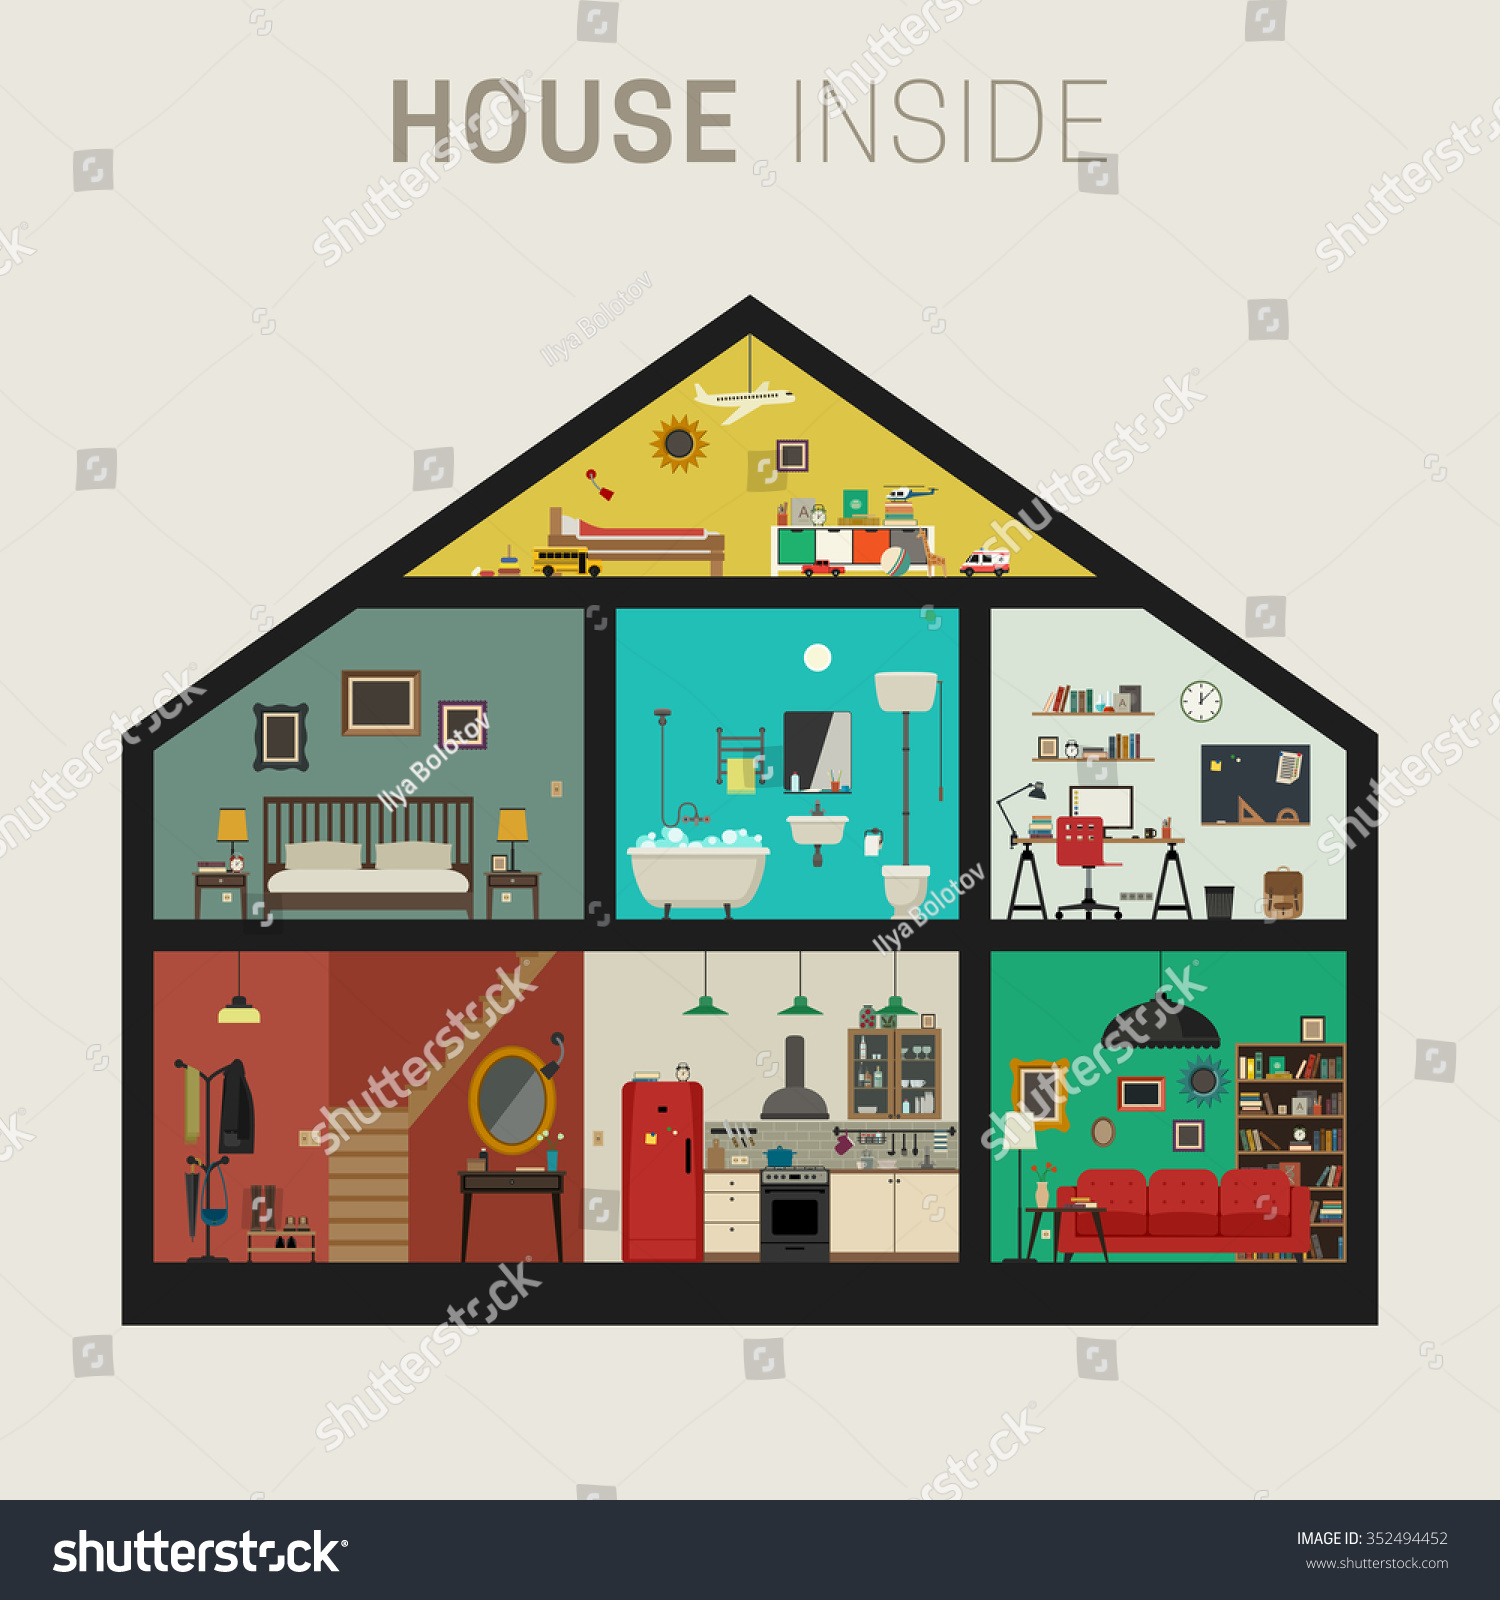 House inside interior vector flat house stock vector for Inside house photos